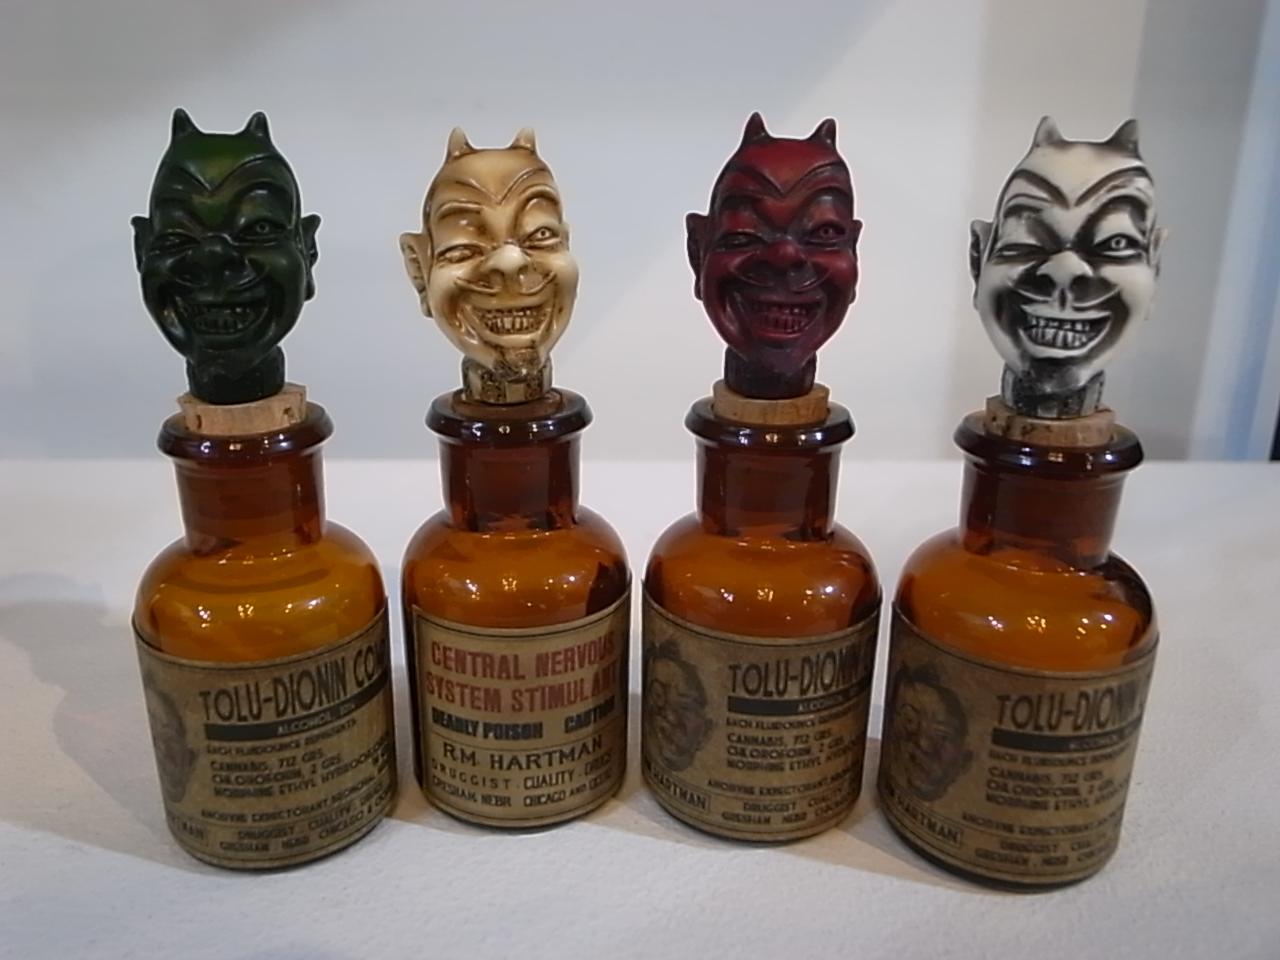 F.B.S.R.MODELS 薬瓶とキーチェーン_a0097901_16545577.jpg